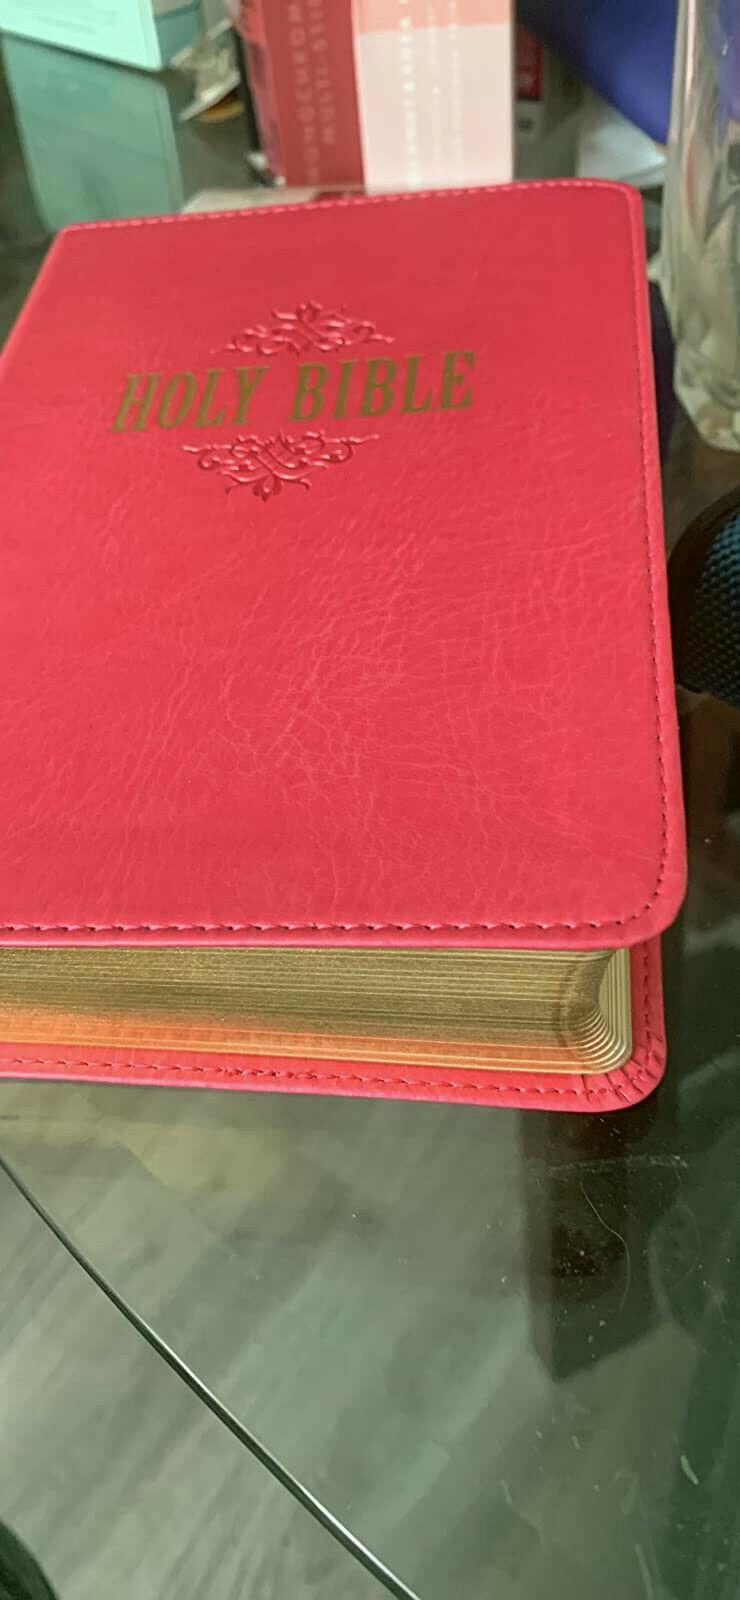 Holy Bible New King James Version NKJV 1992 Nelson Giant Print Red Letter, Good - $27.64